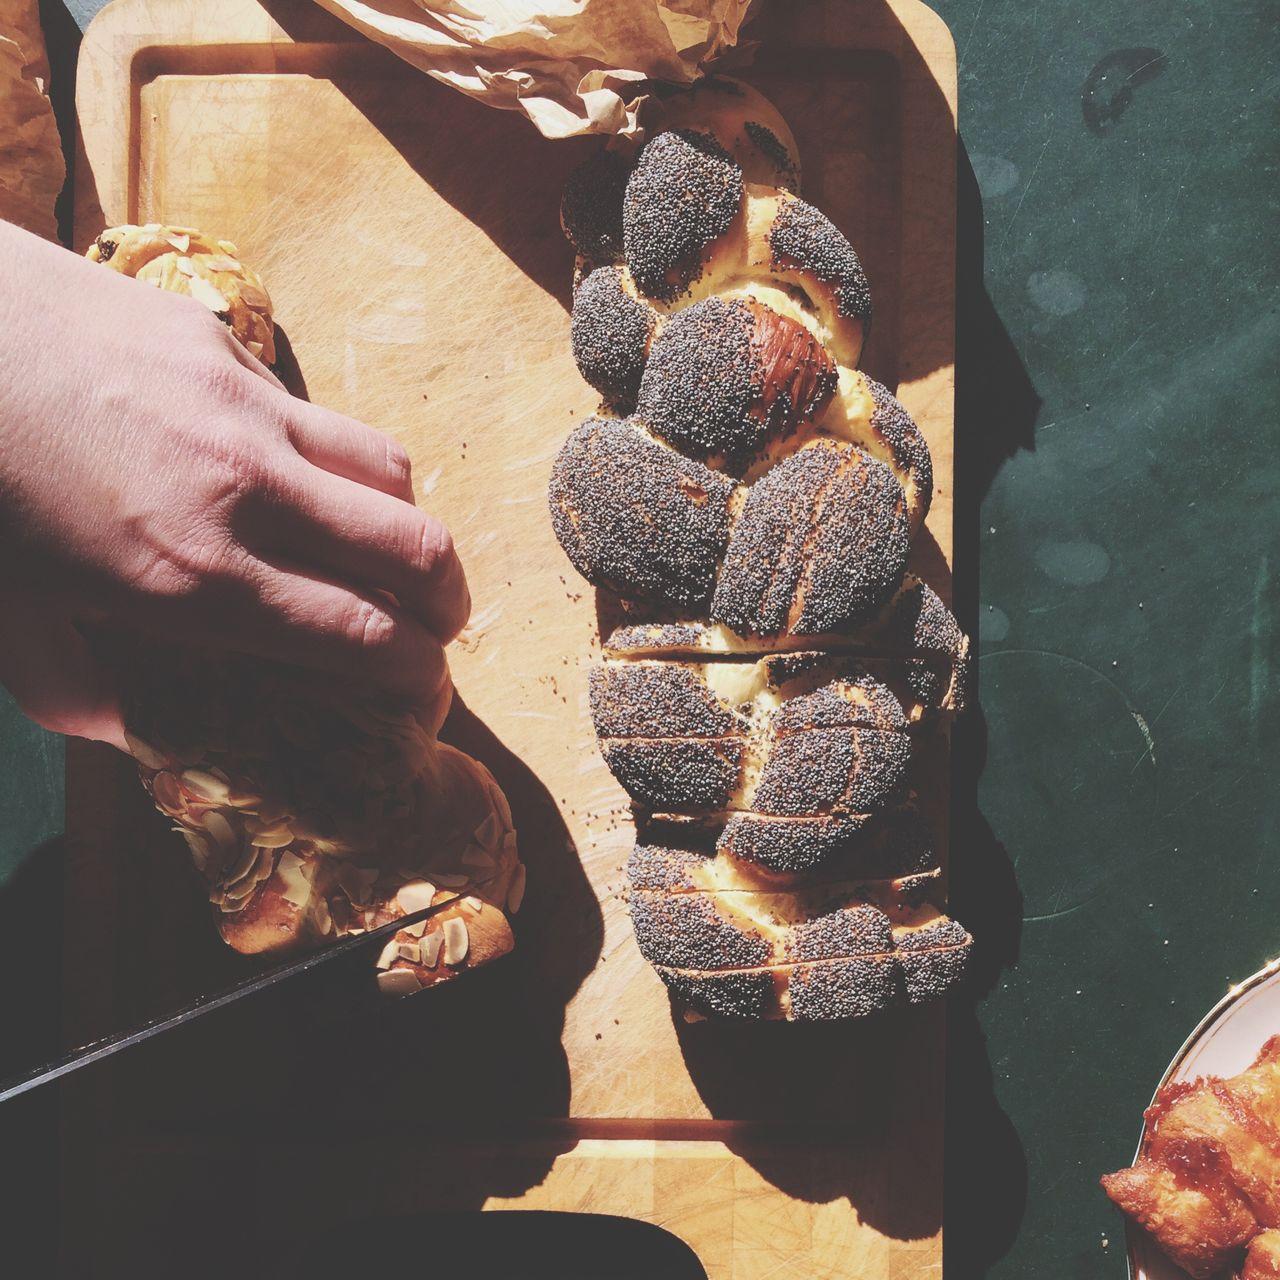 Human Hand Cutting Bread